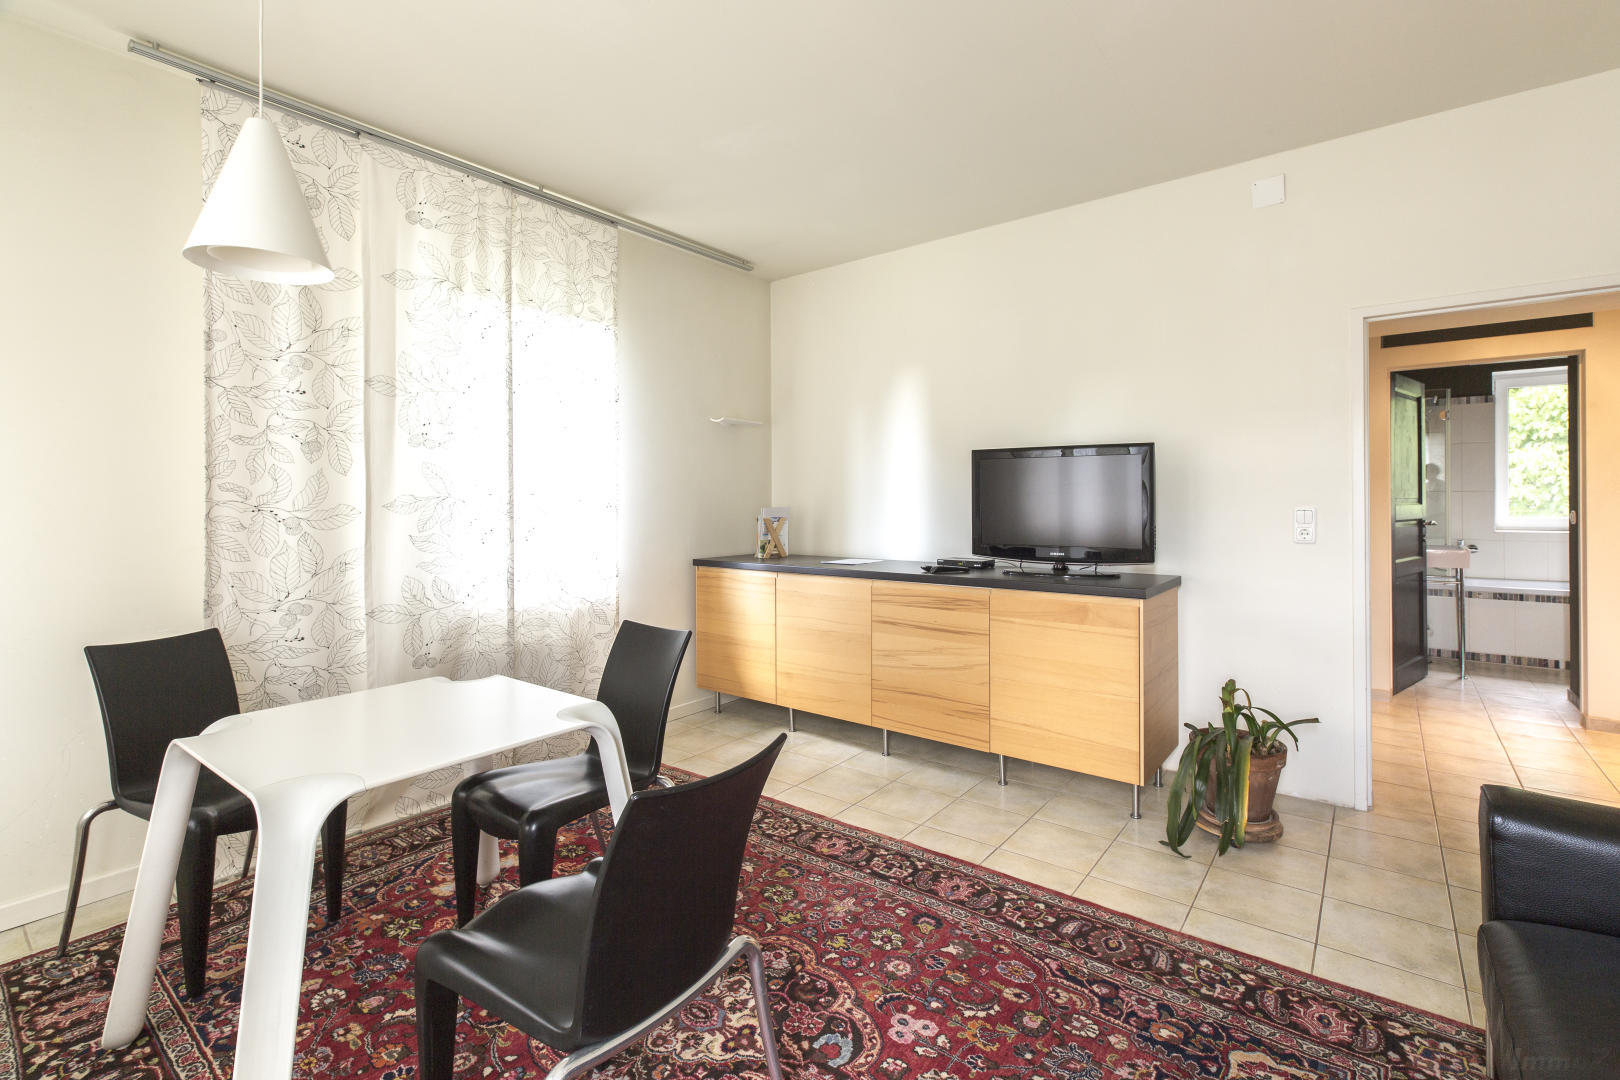 Mietwohnung, 8045 Graz, Andritz